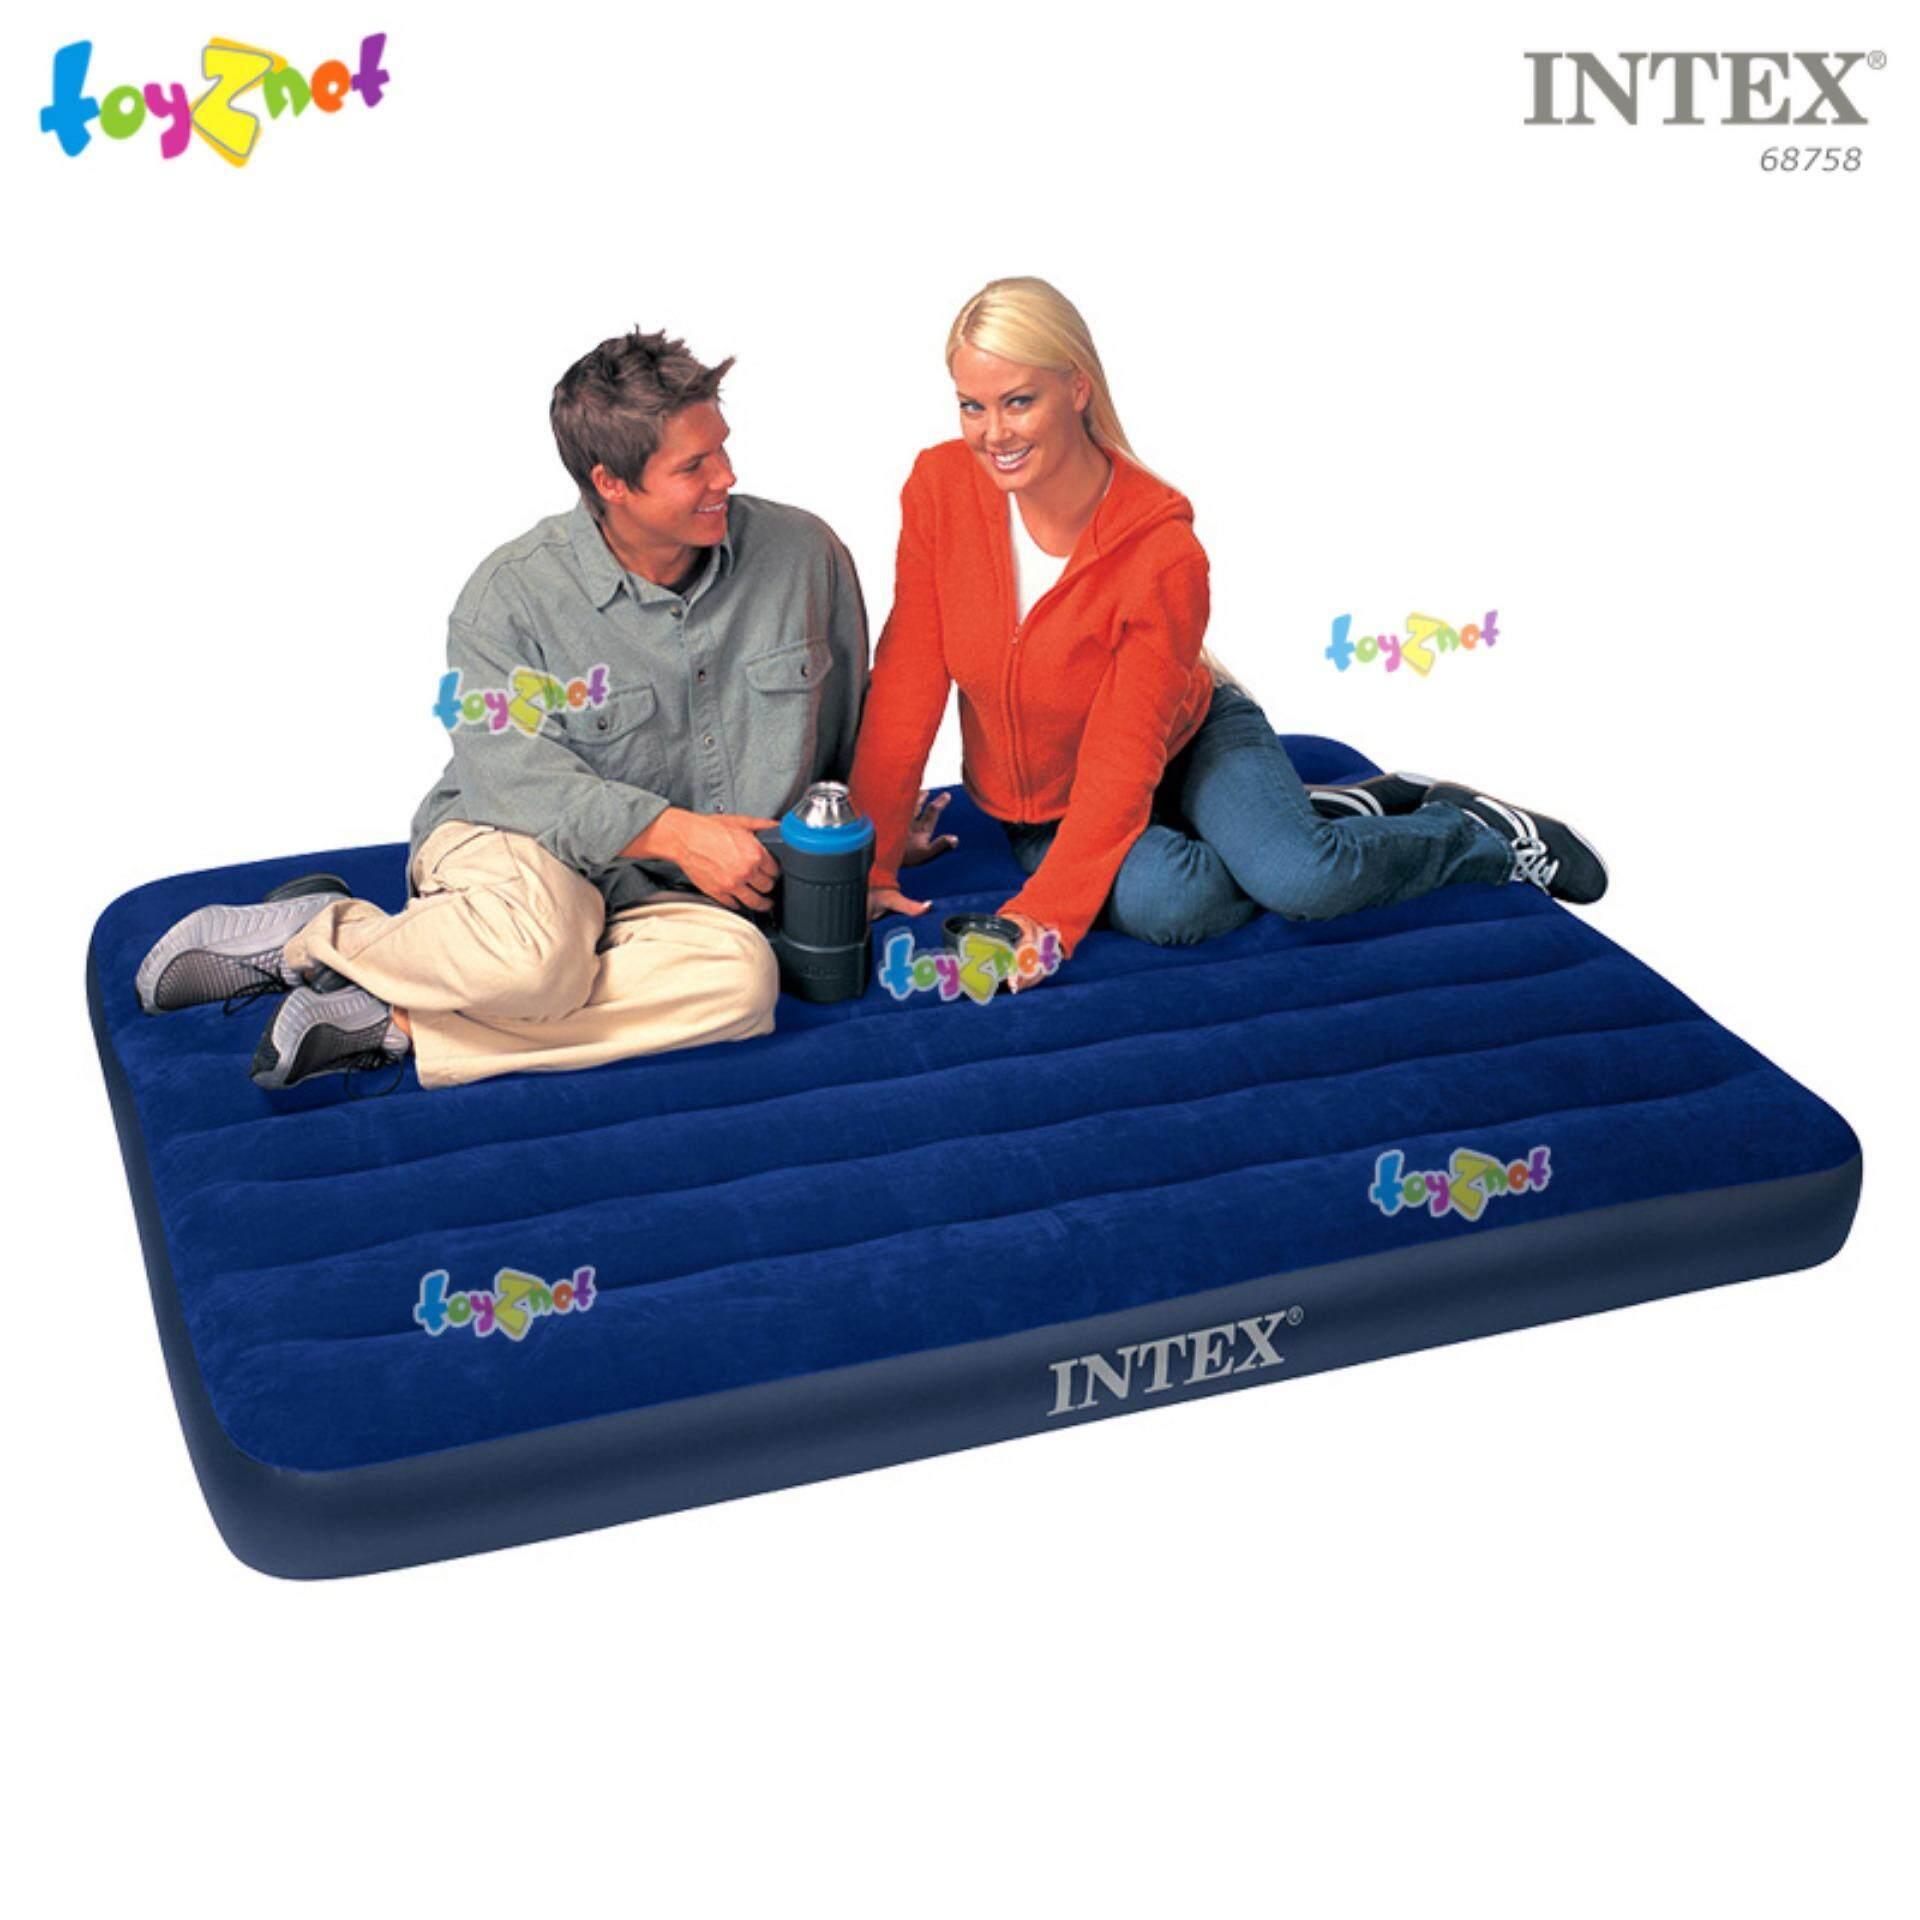 Intex ที่นอนเป่าลม แค้มป์ แคมป์ปิ้ง ปิคนิค 4.5 ฟุต (ฟูล) 137x191x22 ซม. สีน้ำเงิน รุ่น 68758